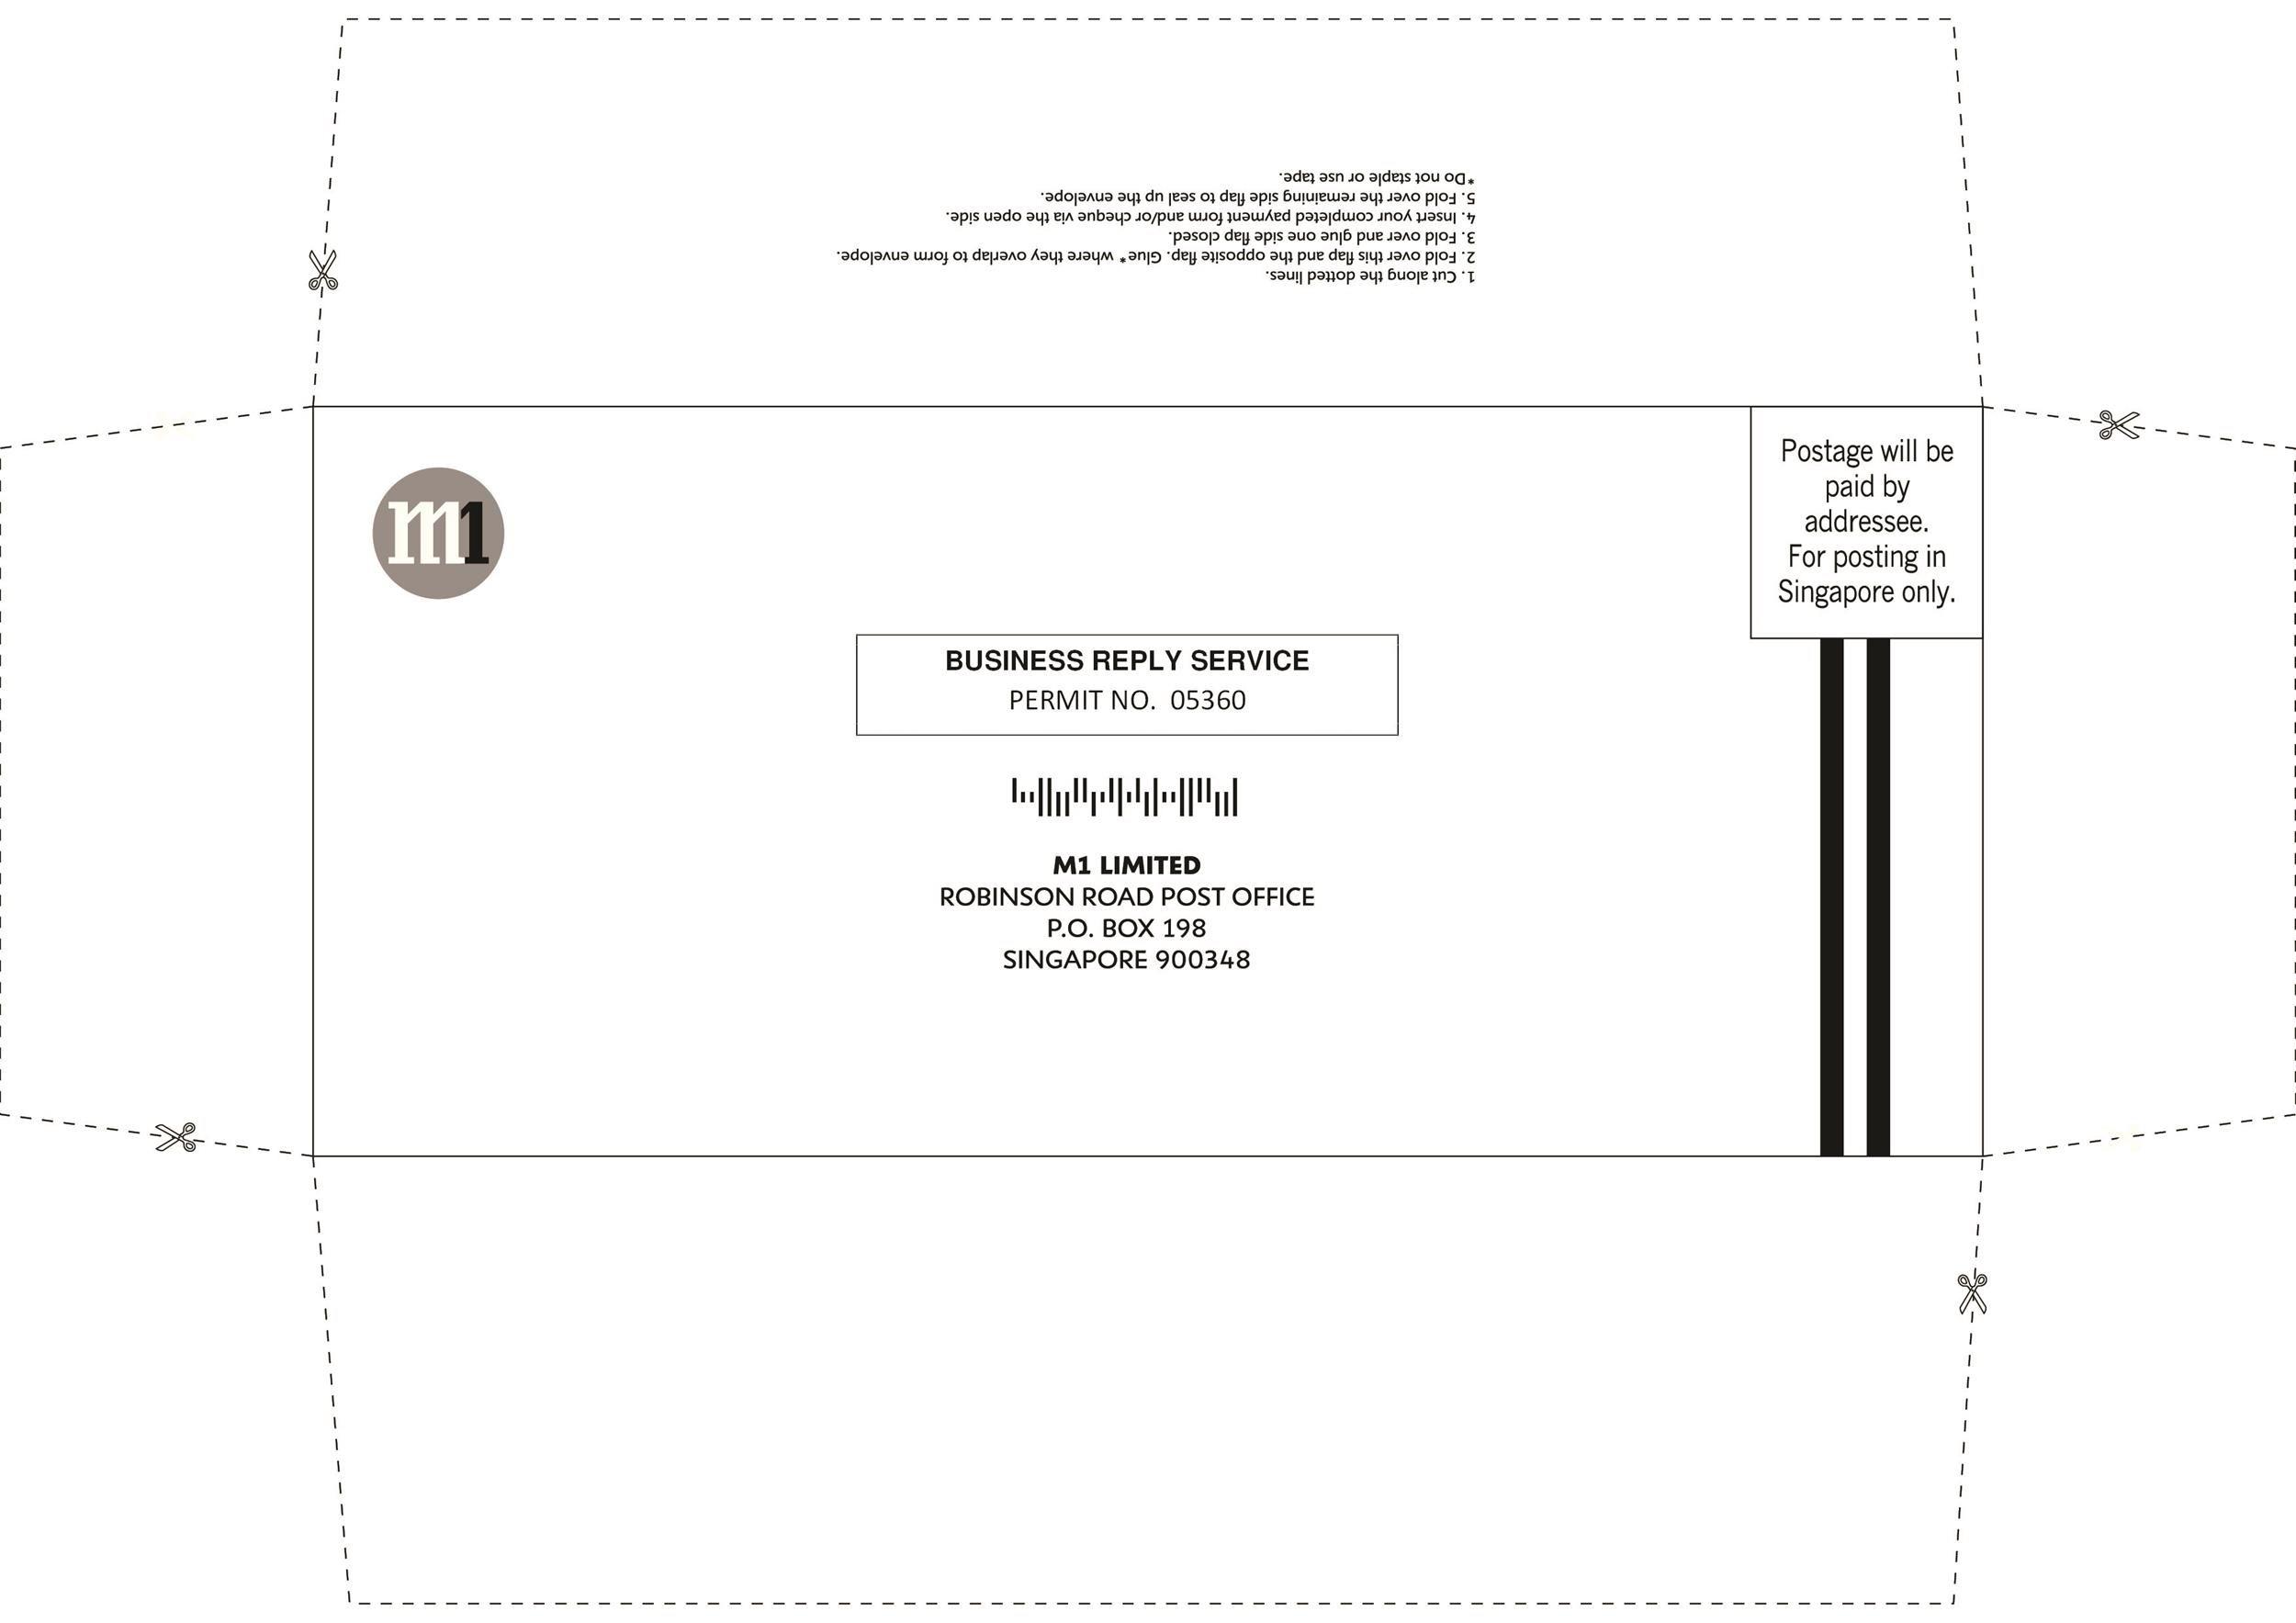 Letter Envelope Template Andriblog.design in 2020